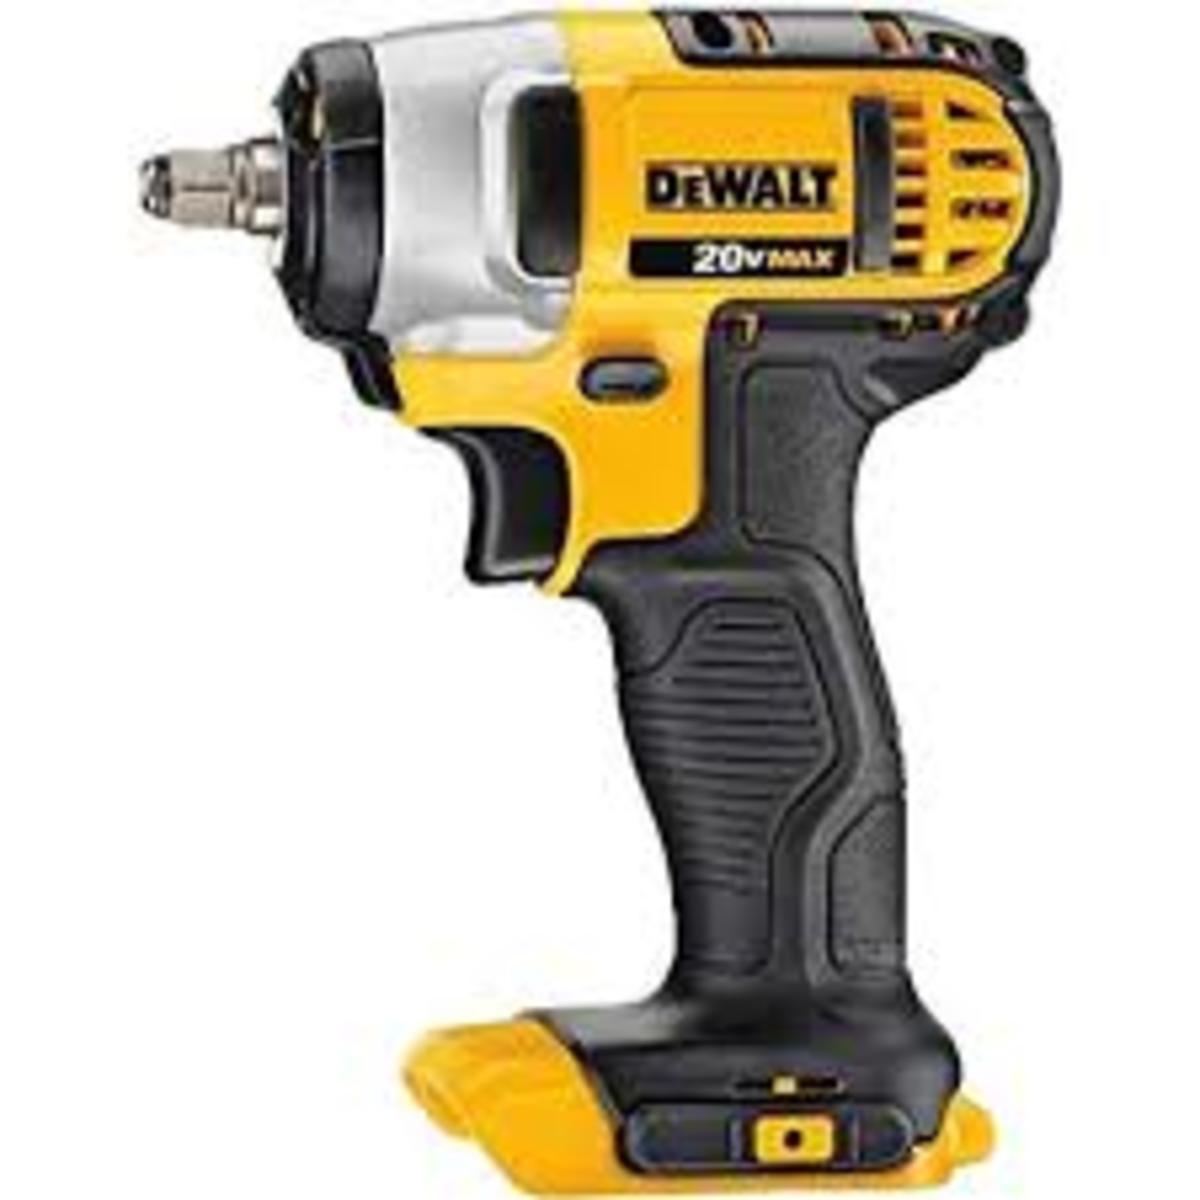 DEWALT DCF883M2 20-volt